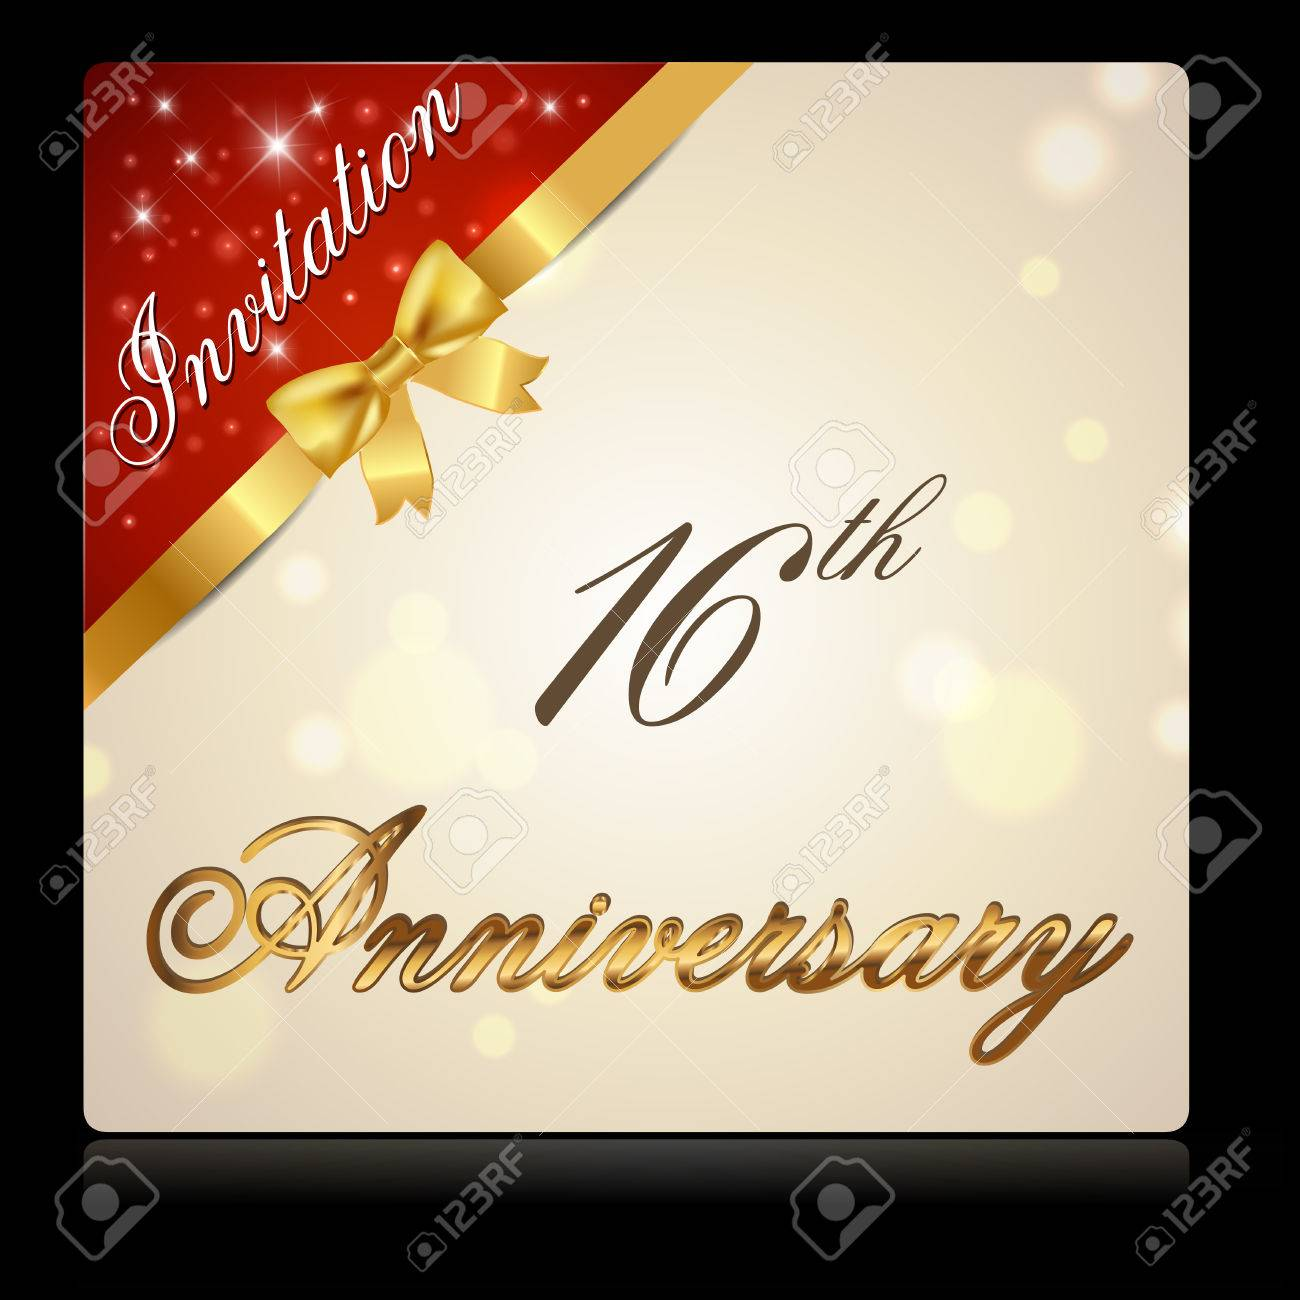 16 Year Anniversary Celebration Golden Ribbon, Decorative Invitation ...